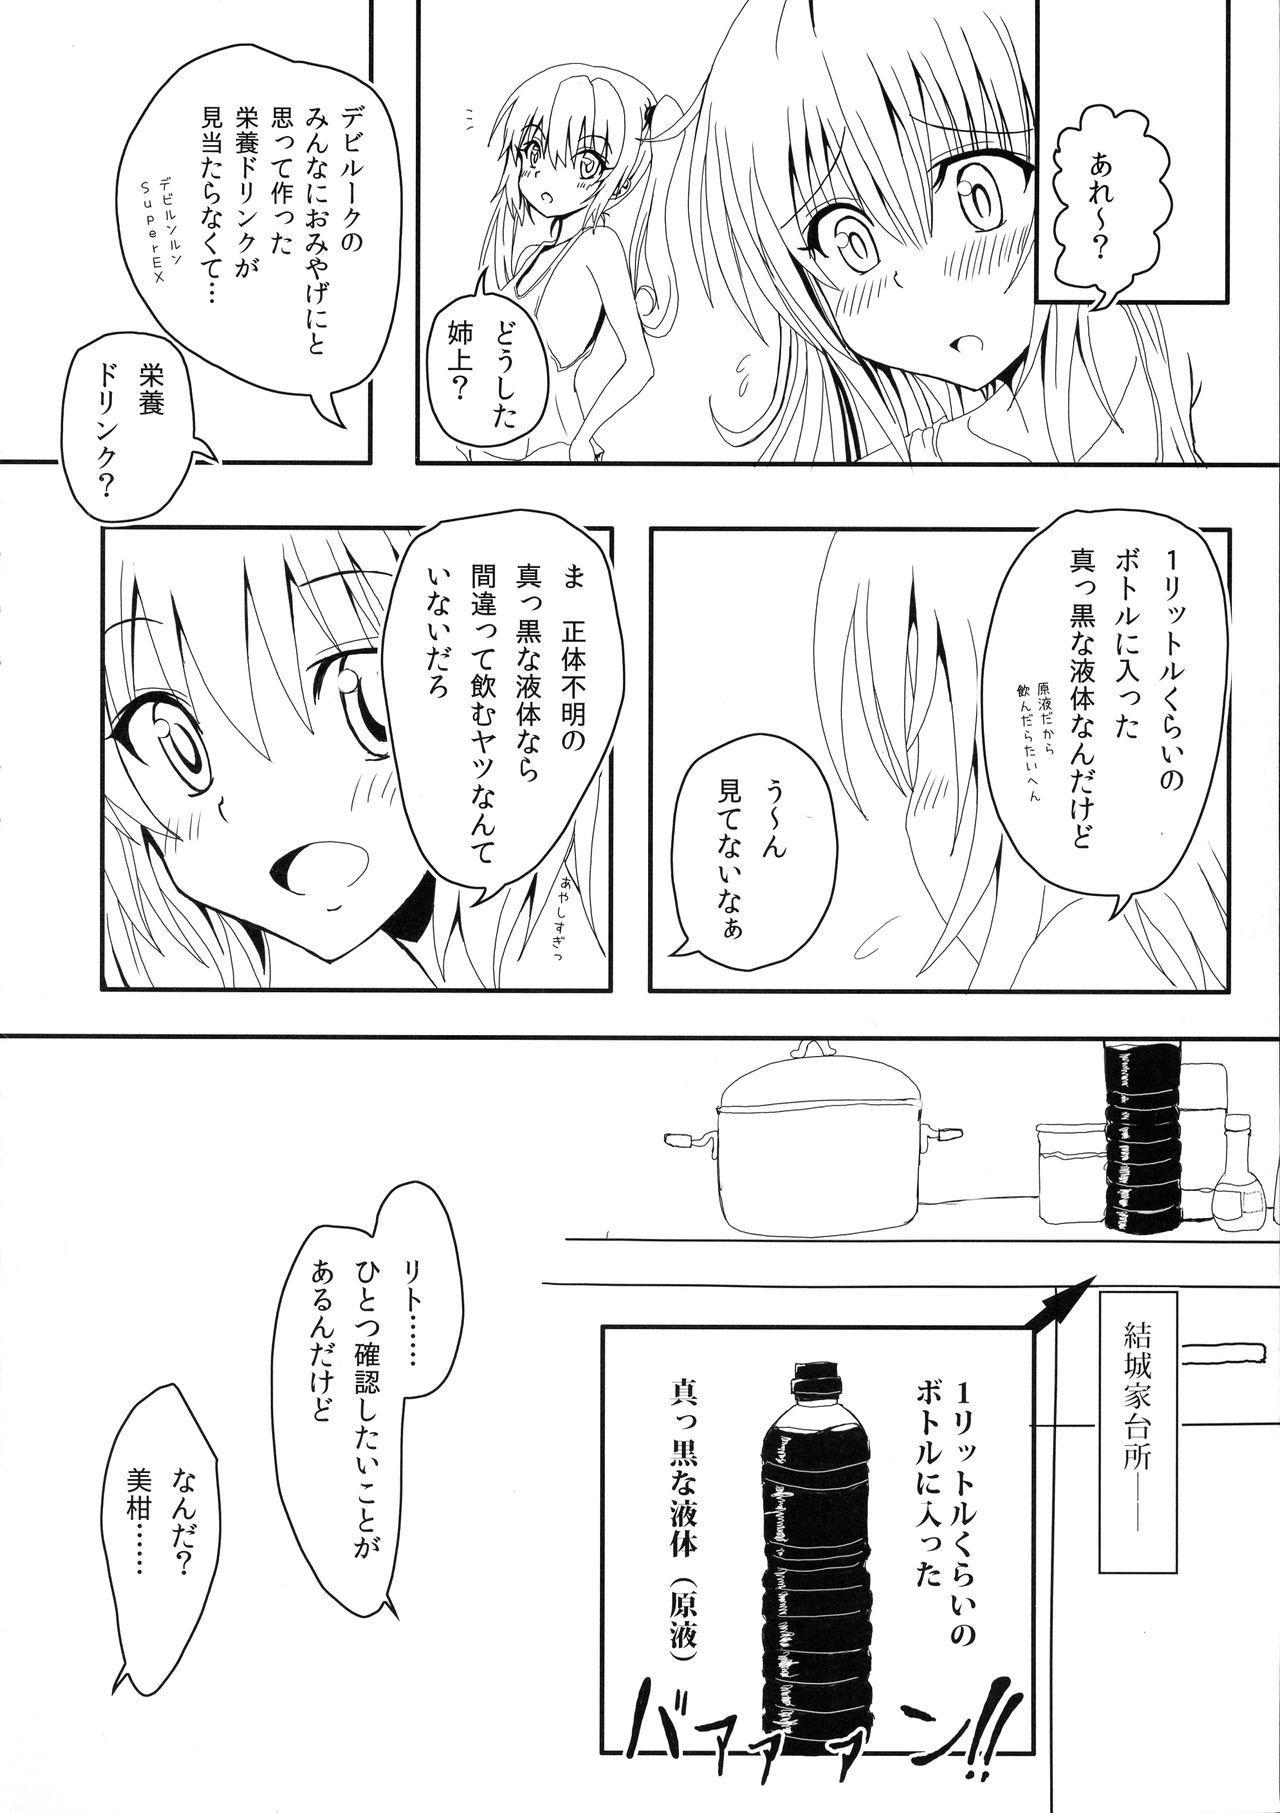 Yami to Mikan no Harenchi Soy Sauce 4